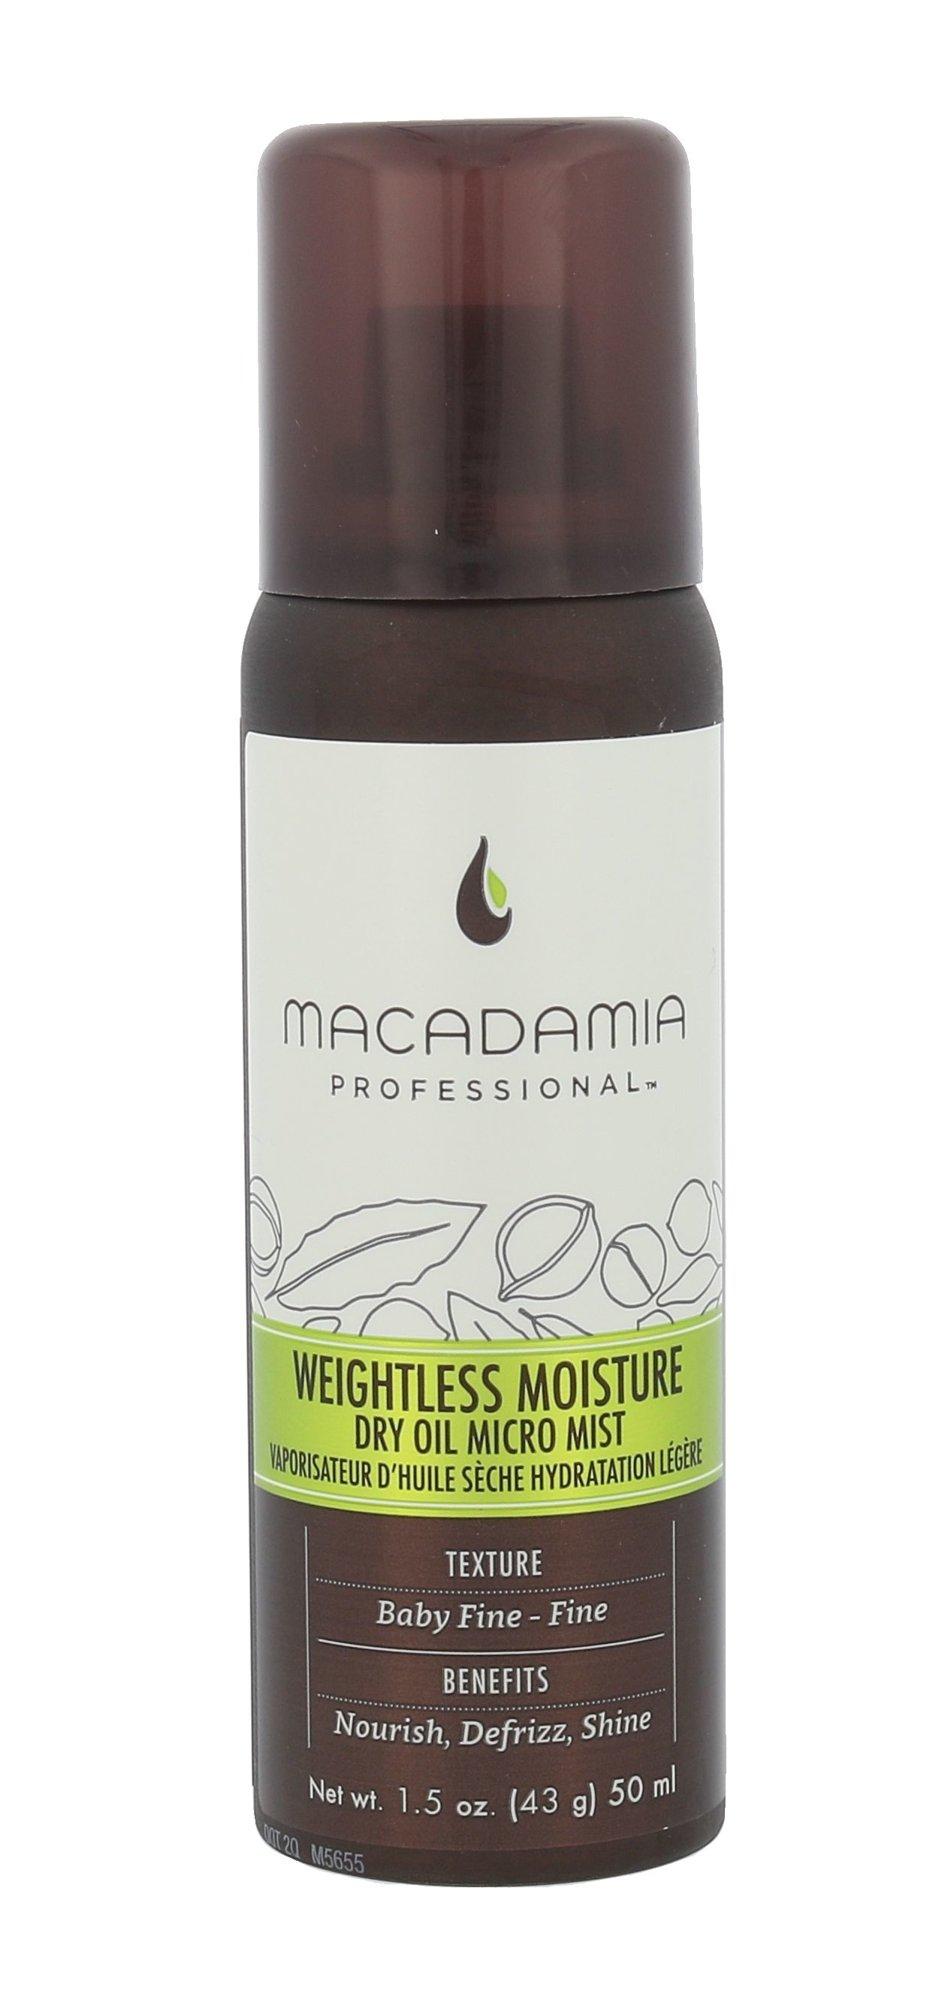 Macadamia Professional Weightless Moisture Cosmetic 50ml